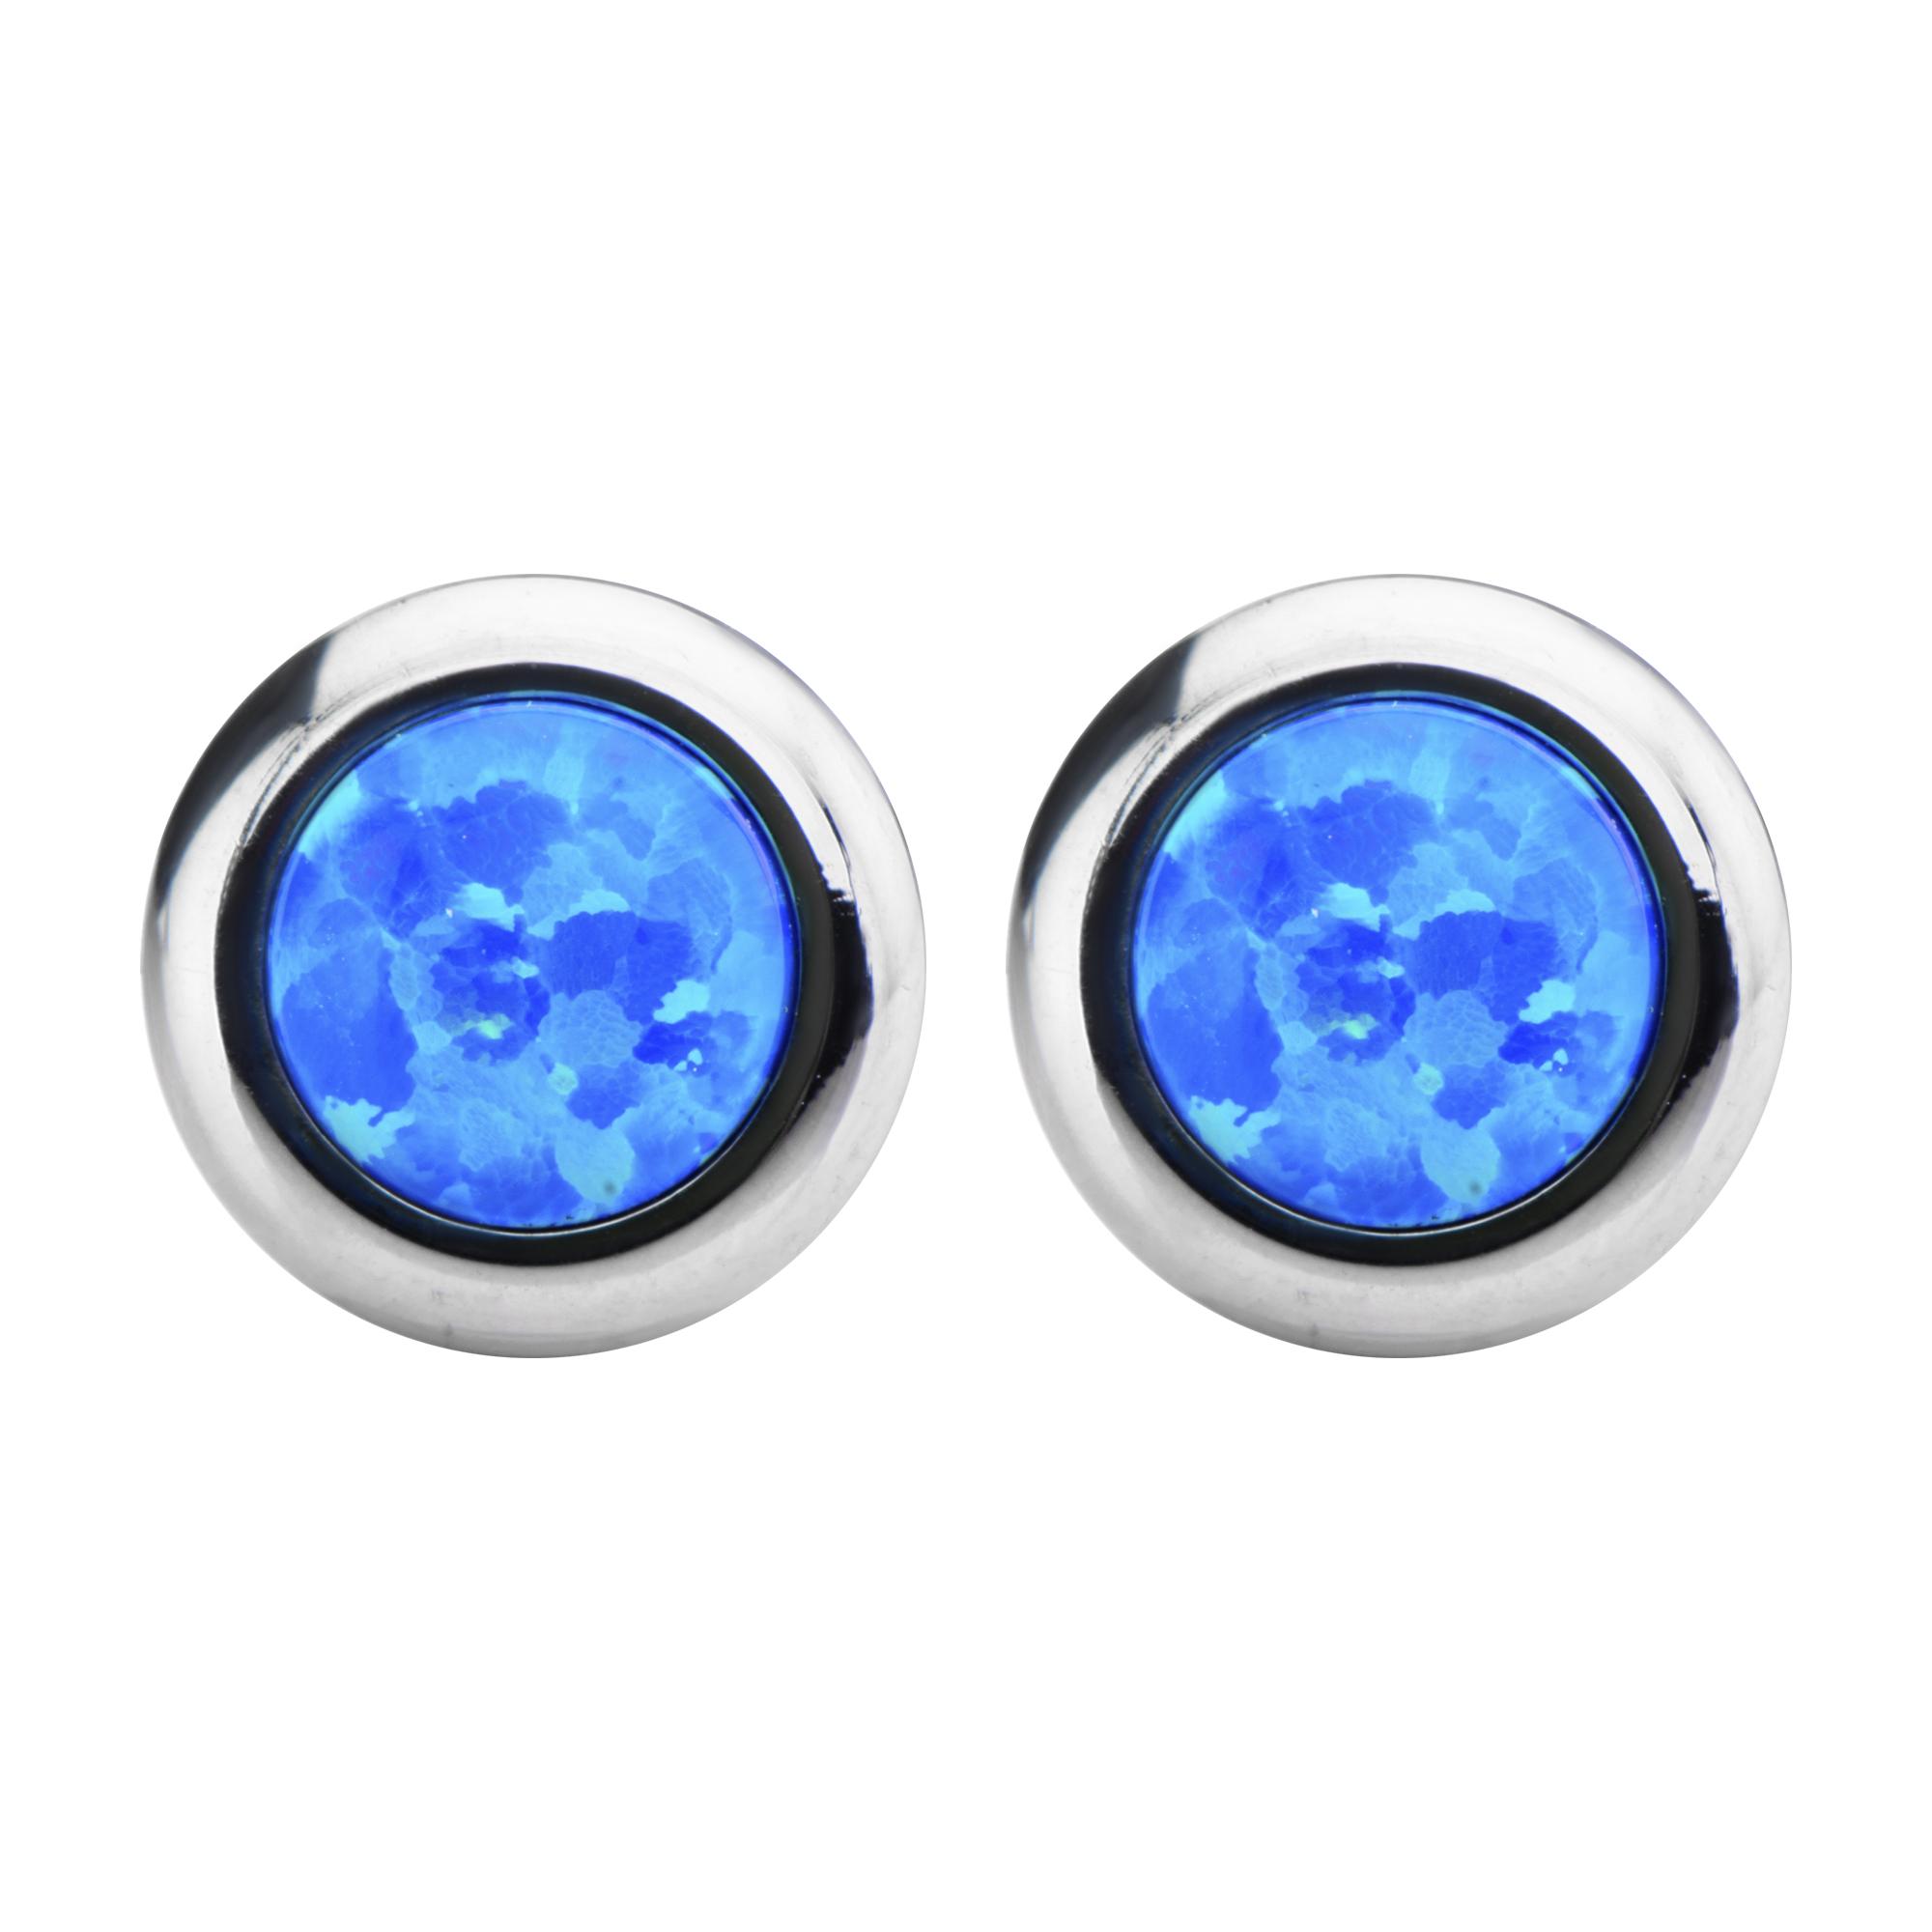 Inox Jewelry Women's Stainless Steel Bezel Set Blue Synthetic Opal Stud Earrings PartNumber: 04437949000P KsnValue: 04437949000 MfgPartNumber: SSE722BO